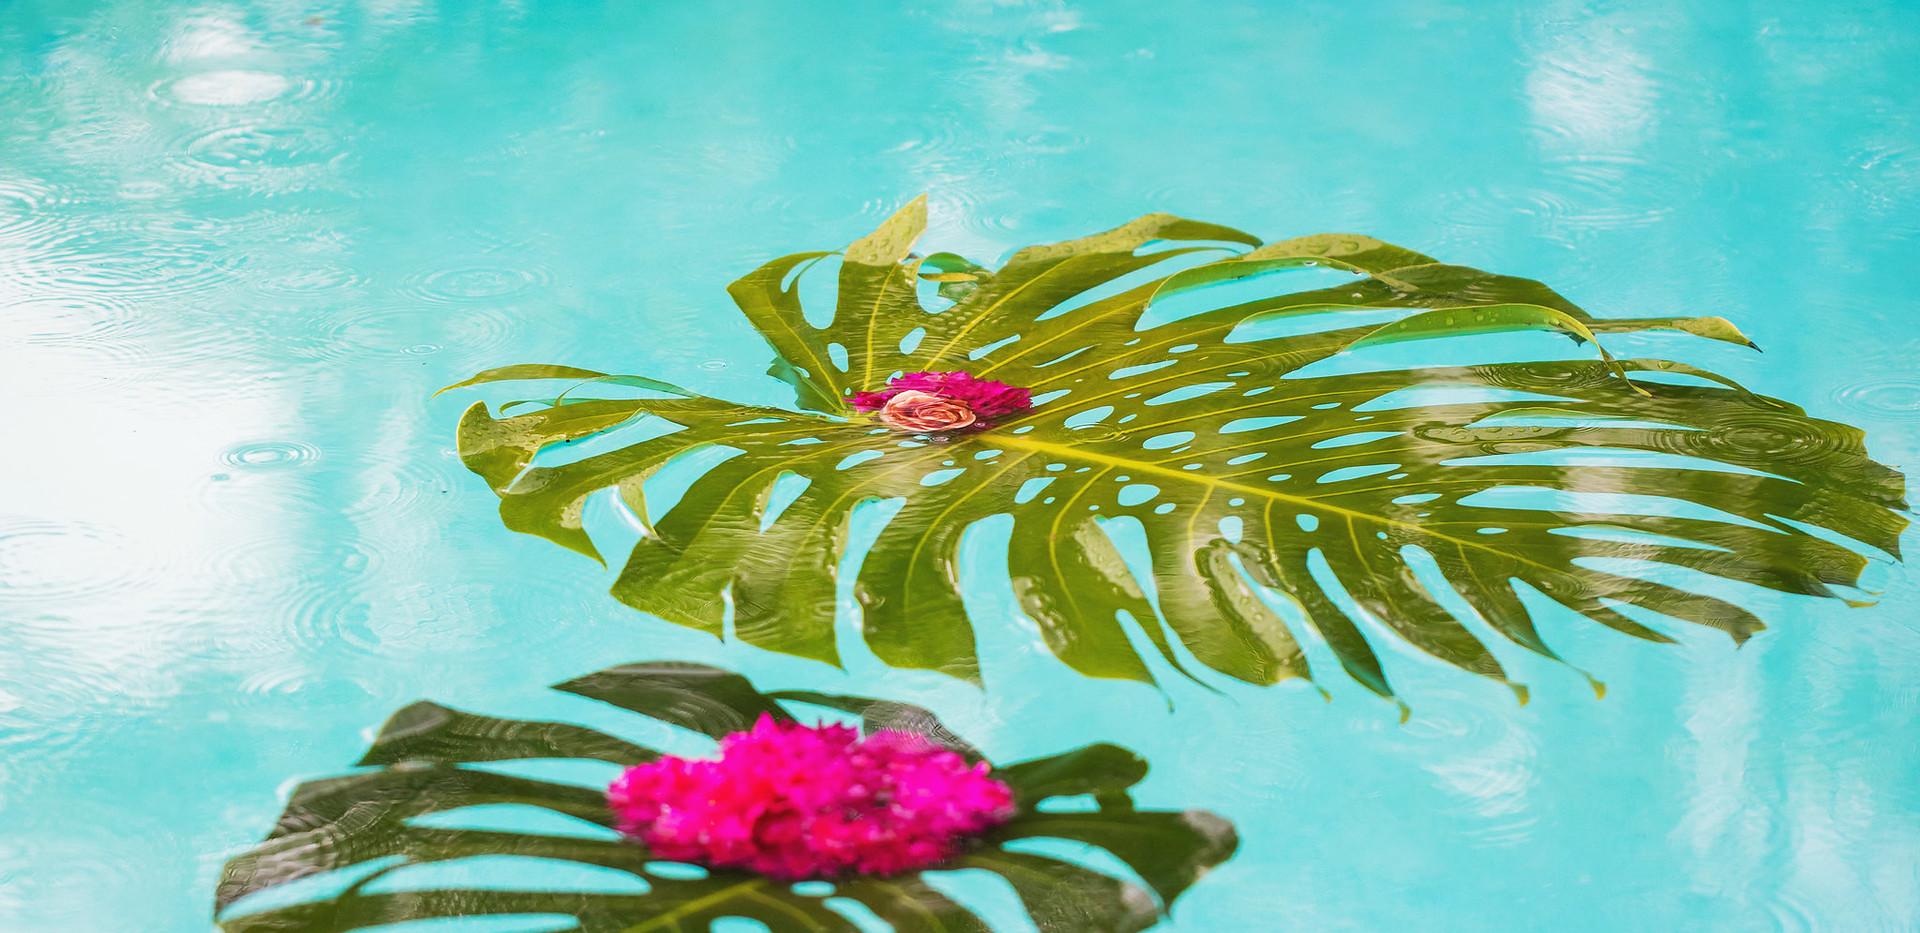 Floating pool decor